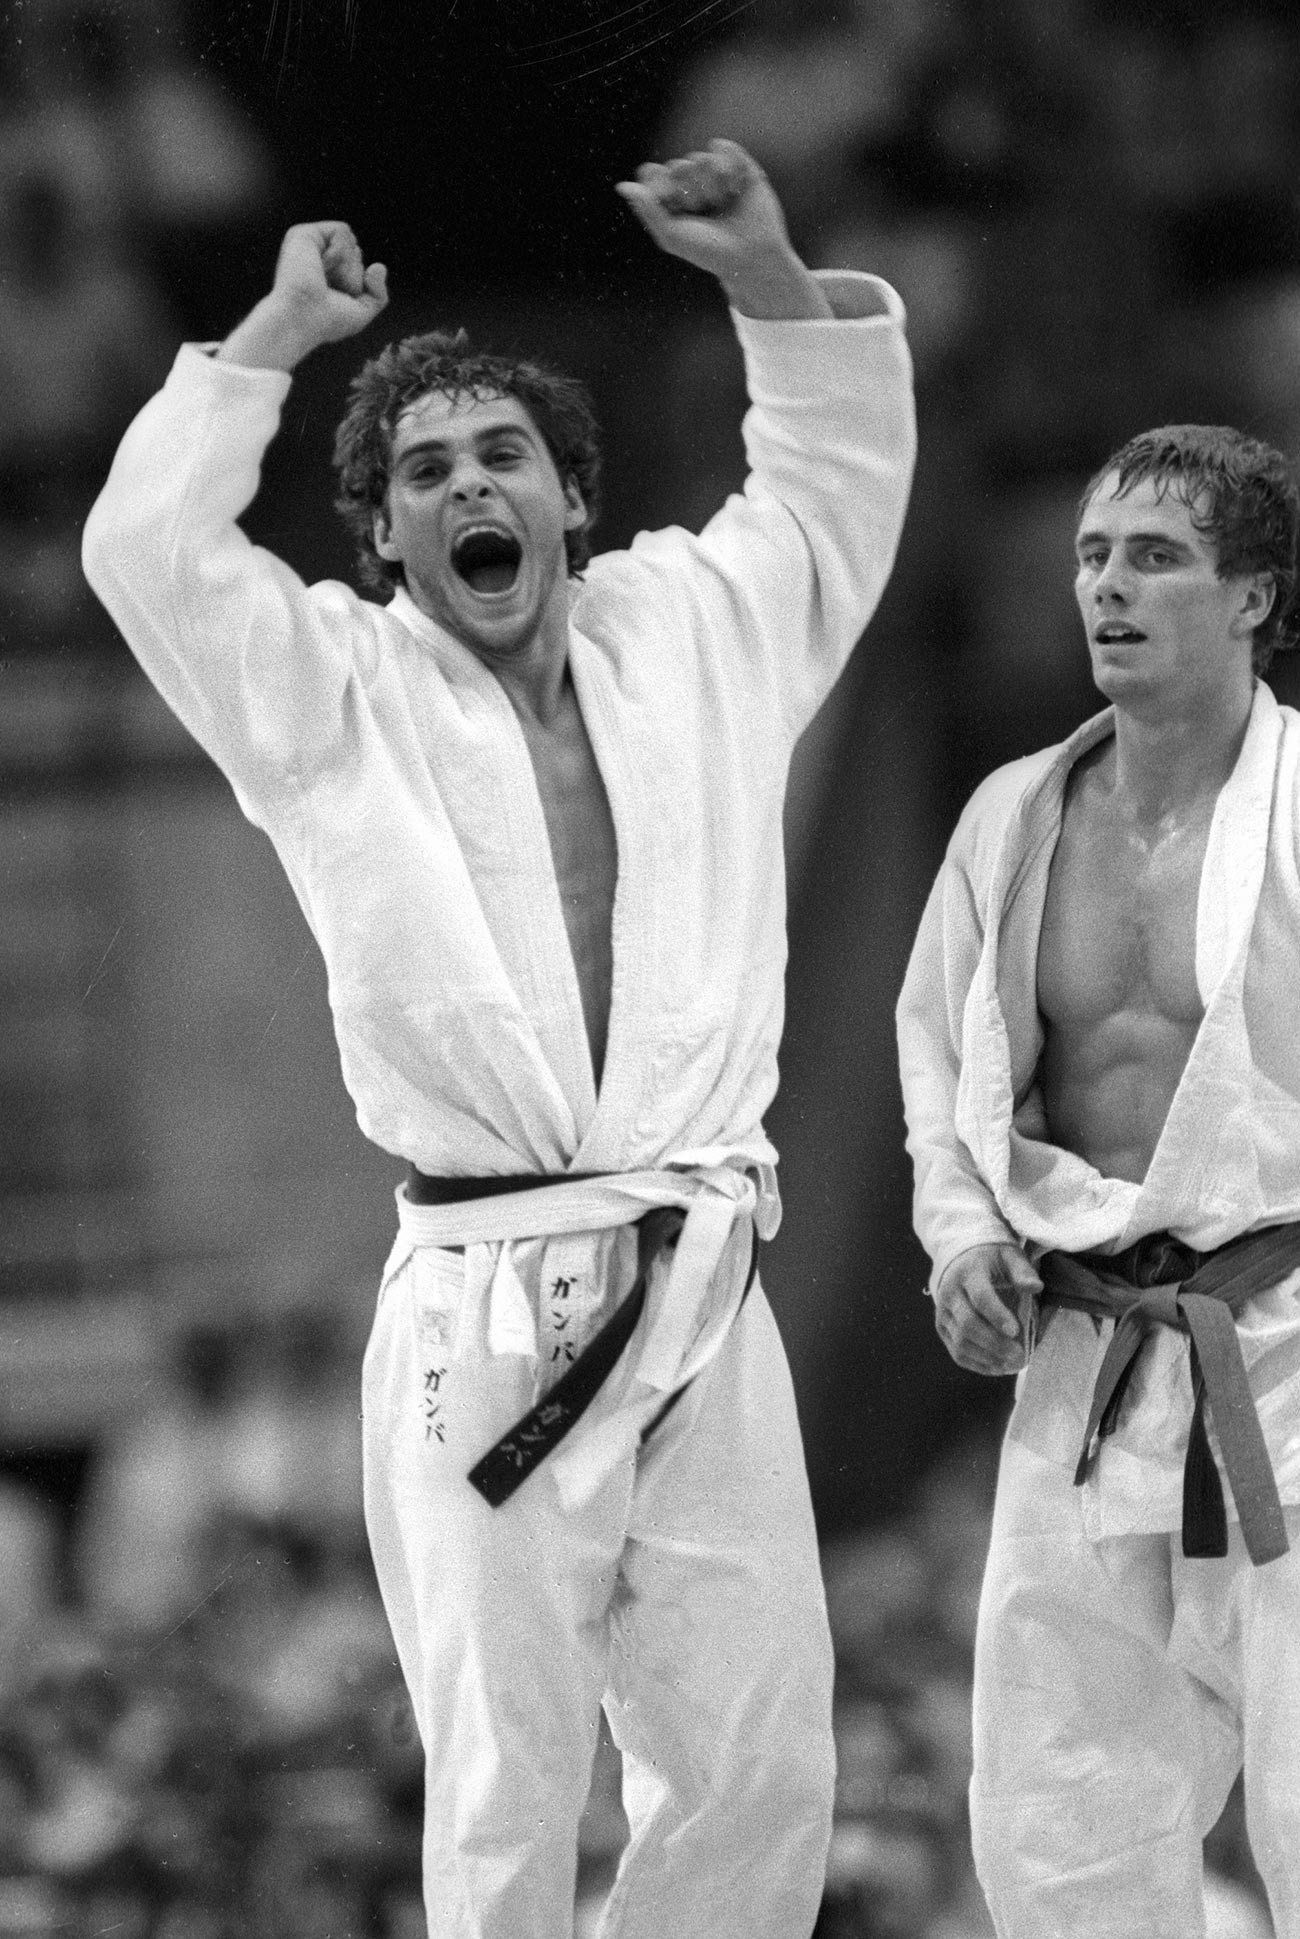 Olimpijski zmagovalec v judu Ezio Gamba na levi